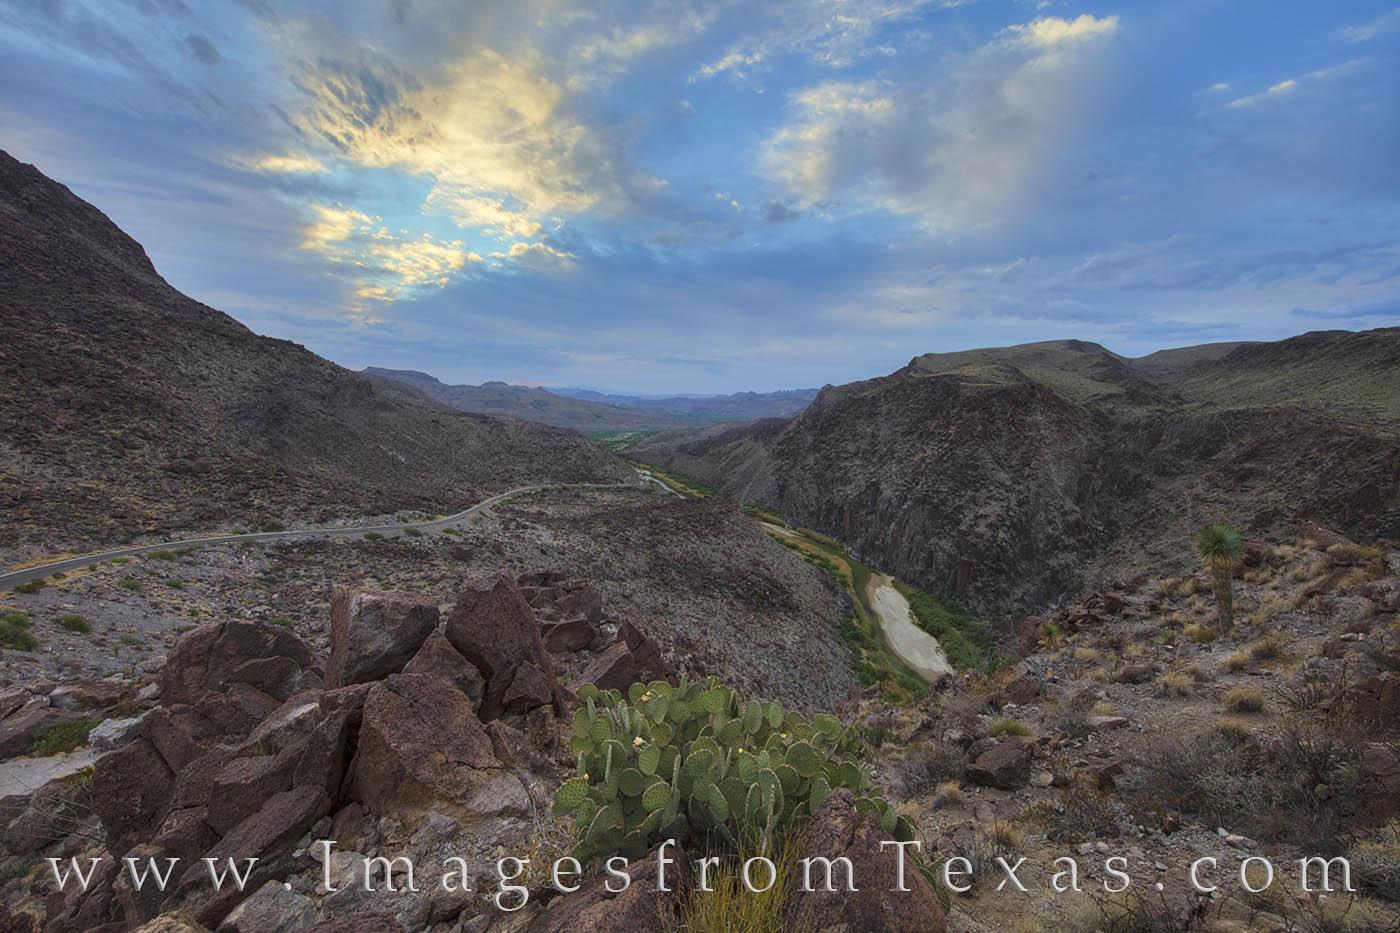 Big Bend Rach, BBRSP, Dom rock, Big Hill, FM 170, Presidio, Lajitas, Rio Grande, Texas border, prickly pear, Texas rivers, photo